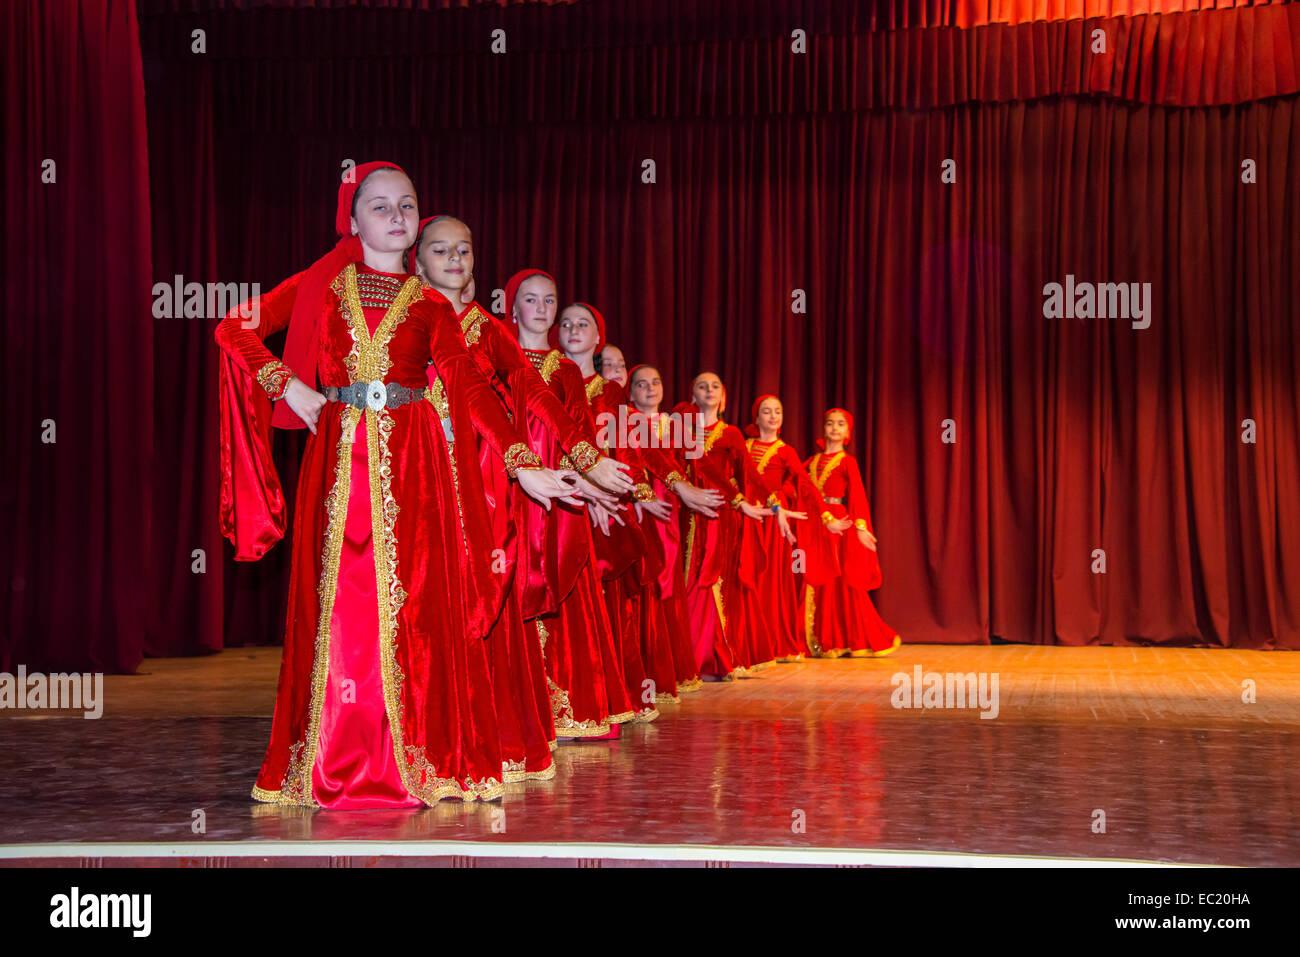 Chechen youth dancing ensemble, Grozny, Chechnya, Caucasus, Russia - Stock Image